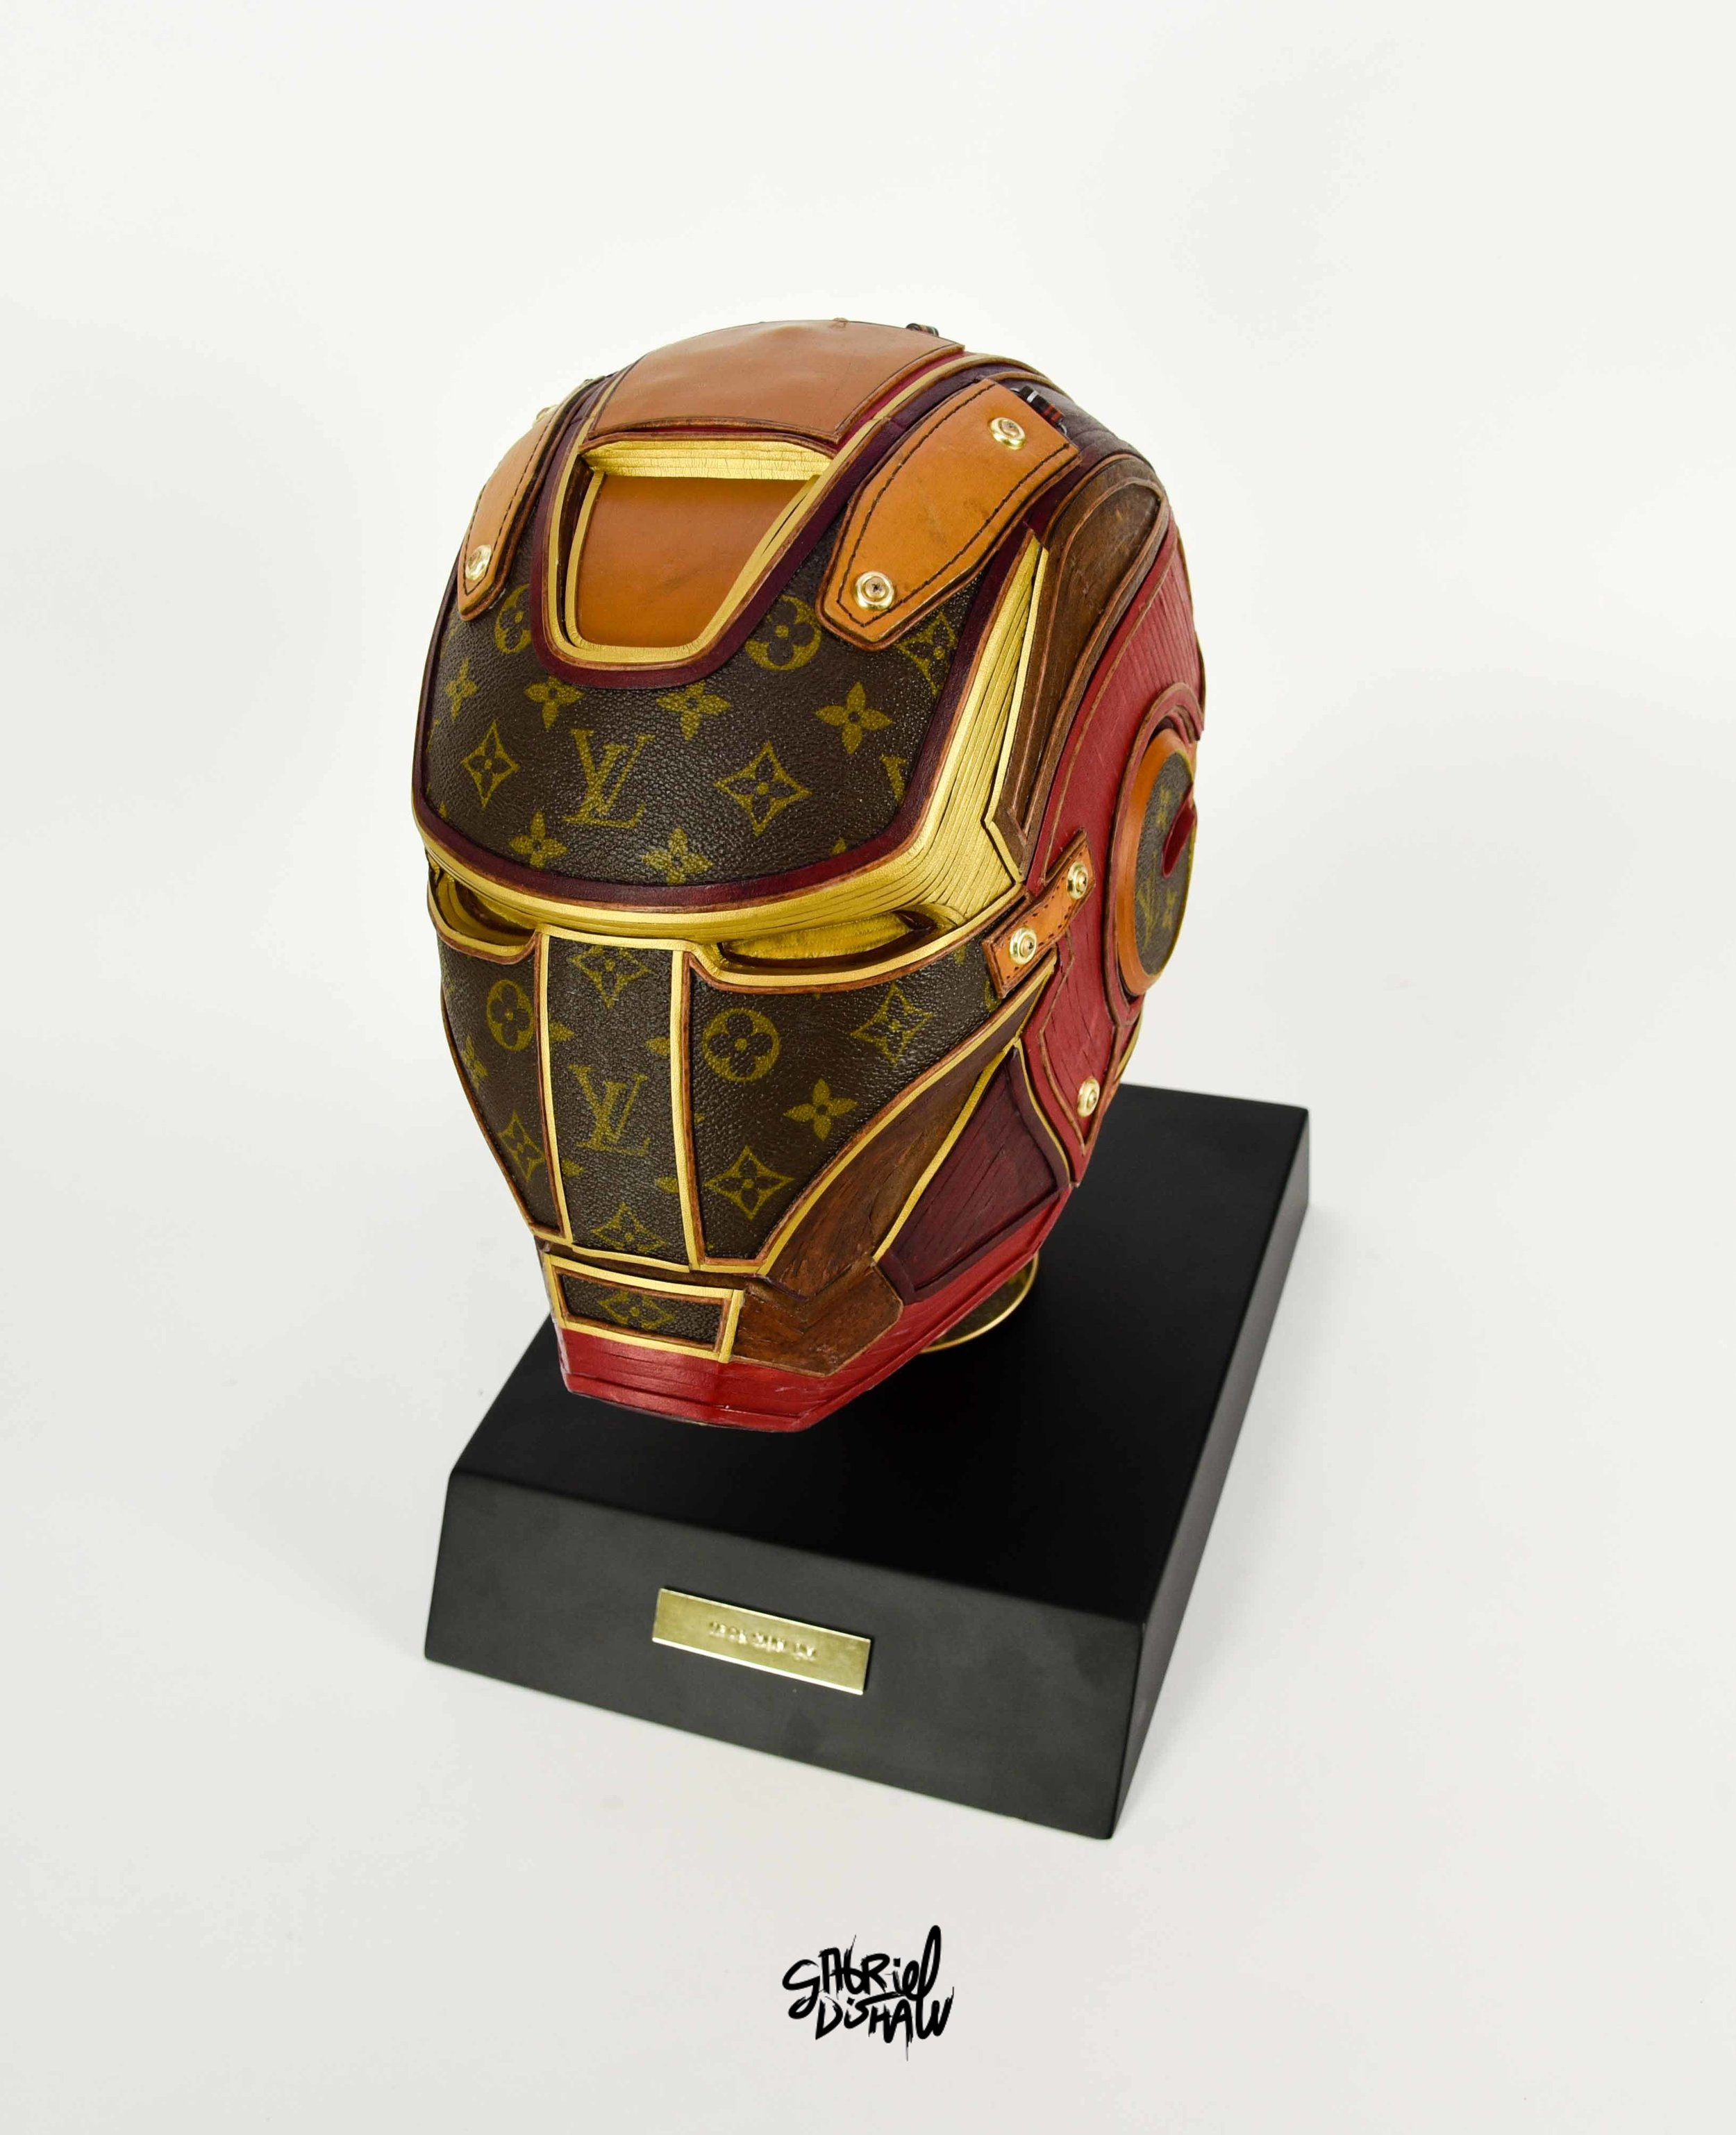 Gabriel Dishaw Iron Man LV-4298.jpg